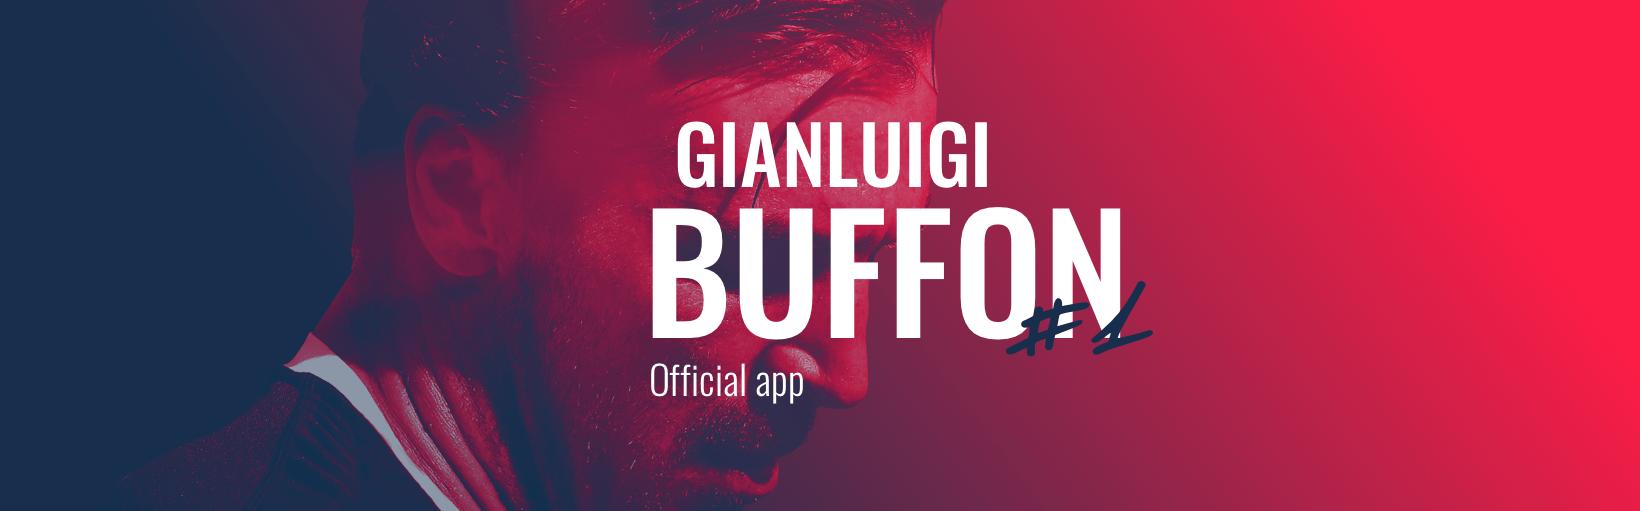 Gianluigi Buffon Official App